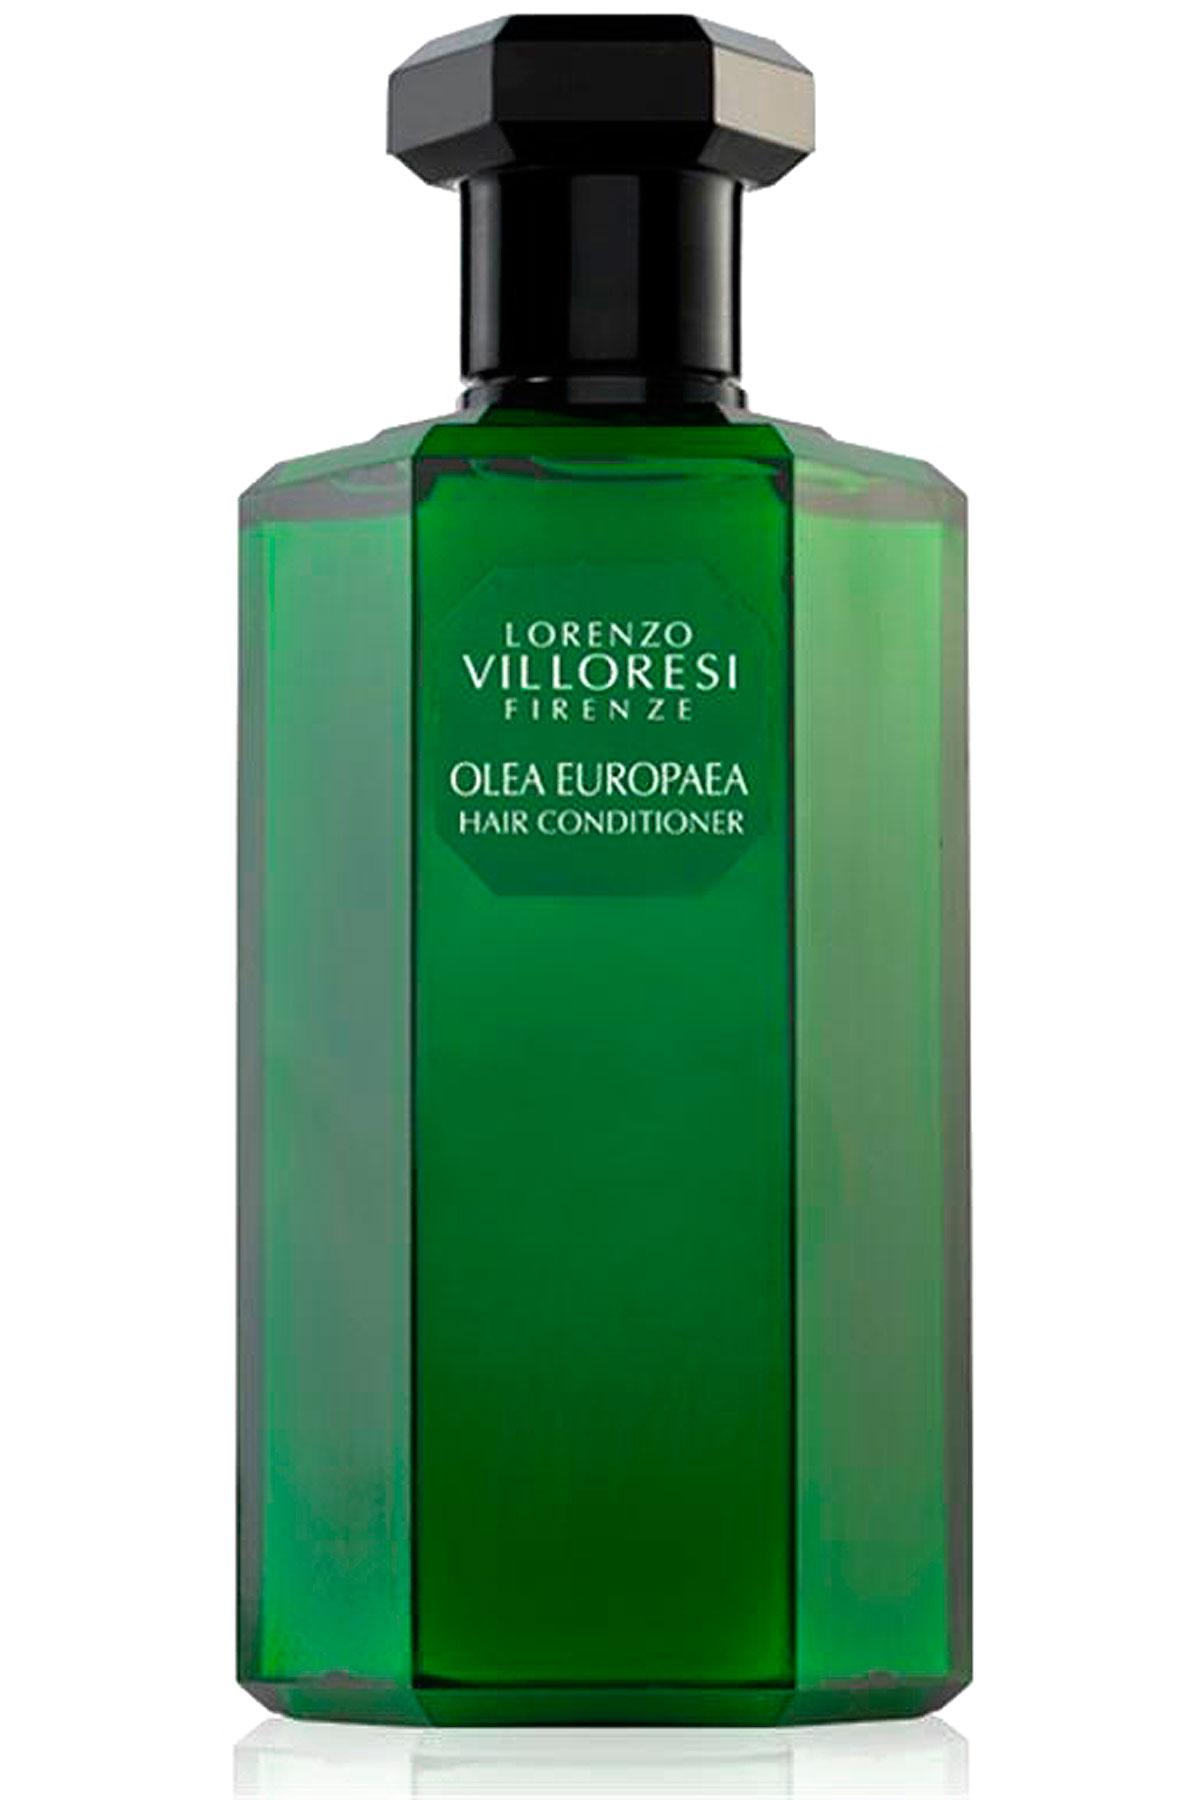 Lorenzo Villoresi Beauty for Women, Olea - Conditioner - 125 Ml, 2019, 125 ml